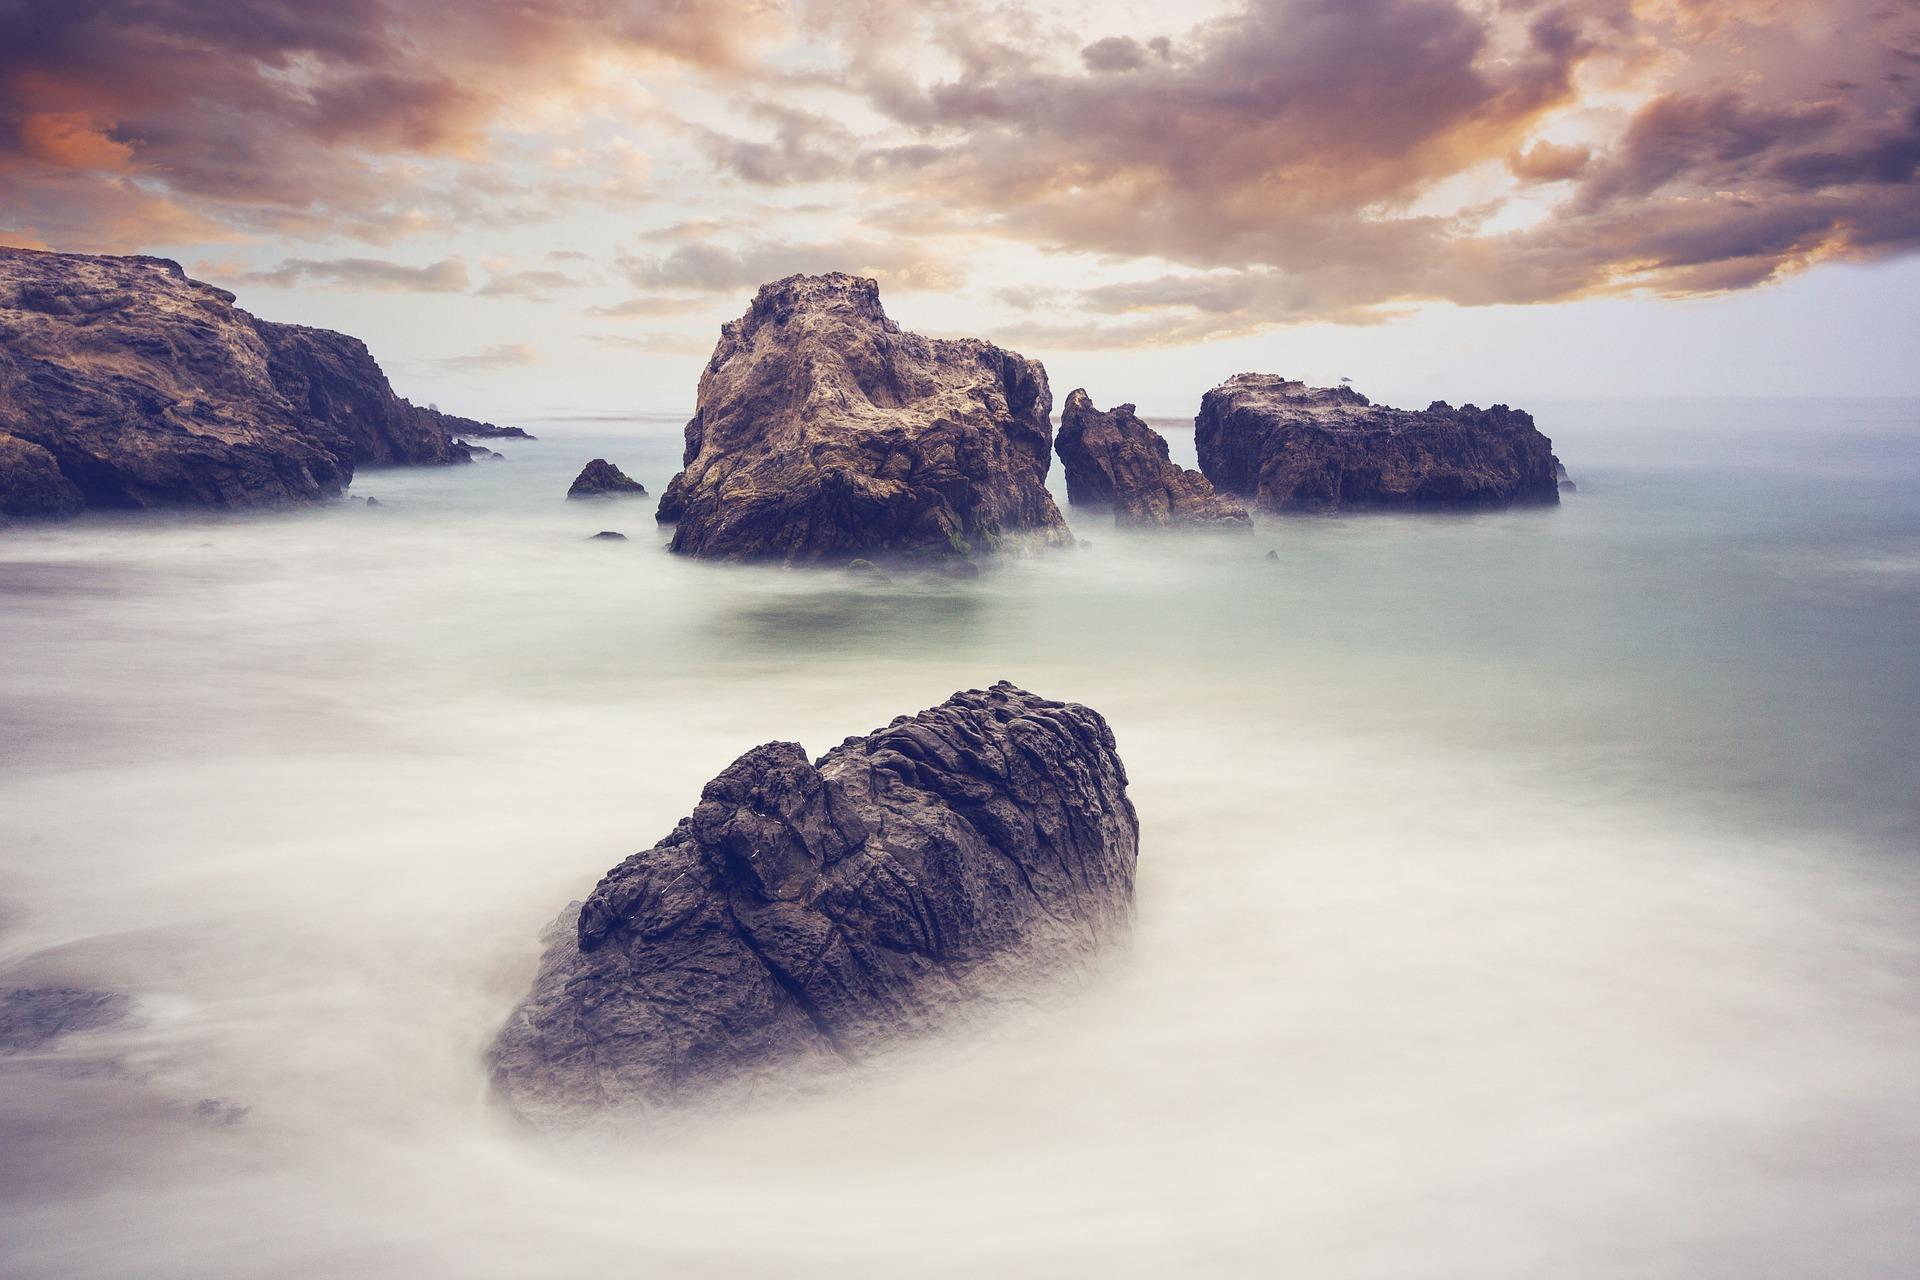 rocas, niebla, océano, calma, nubes - Fondos de Pantalla HD - professor-falken.com